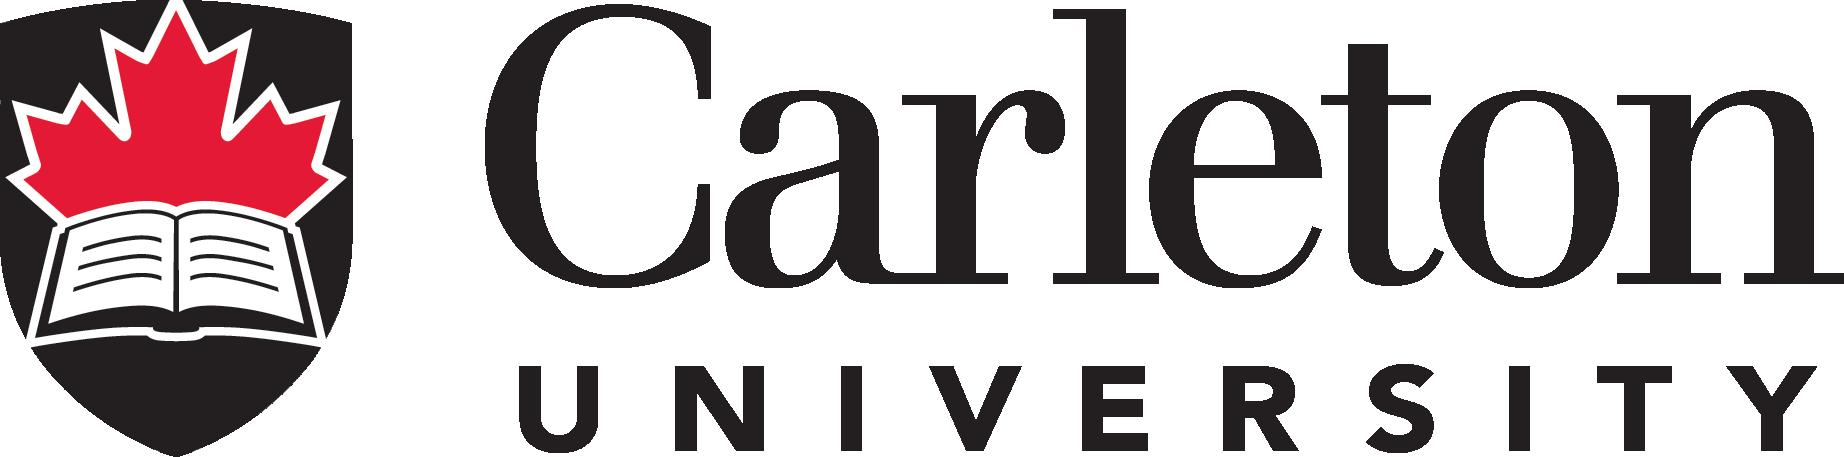 Carlton University.png